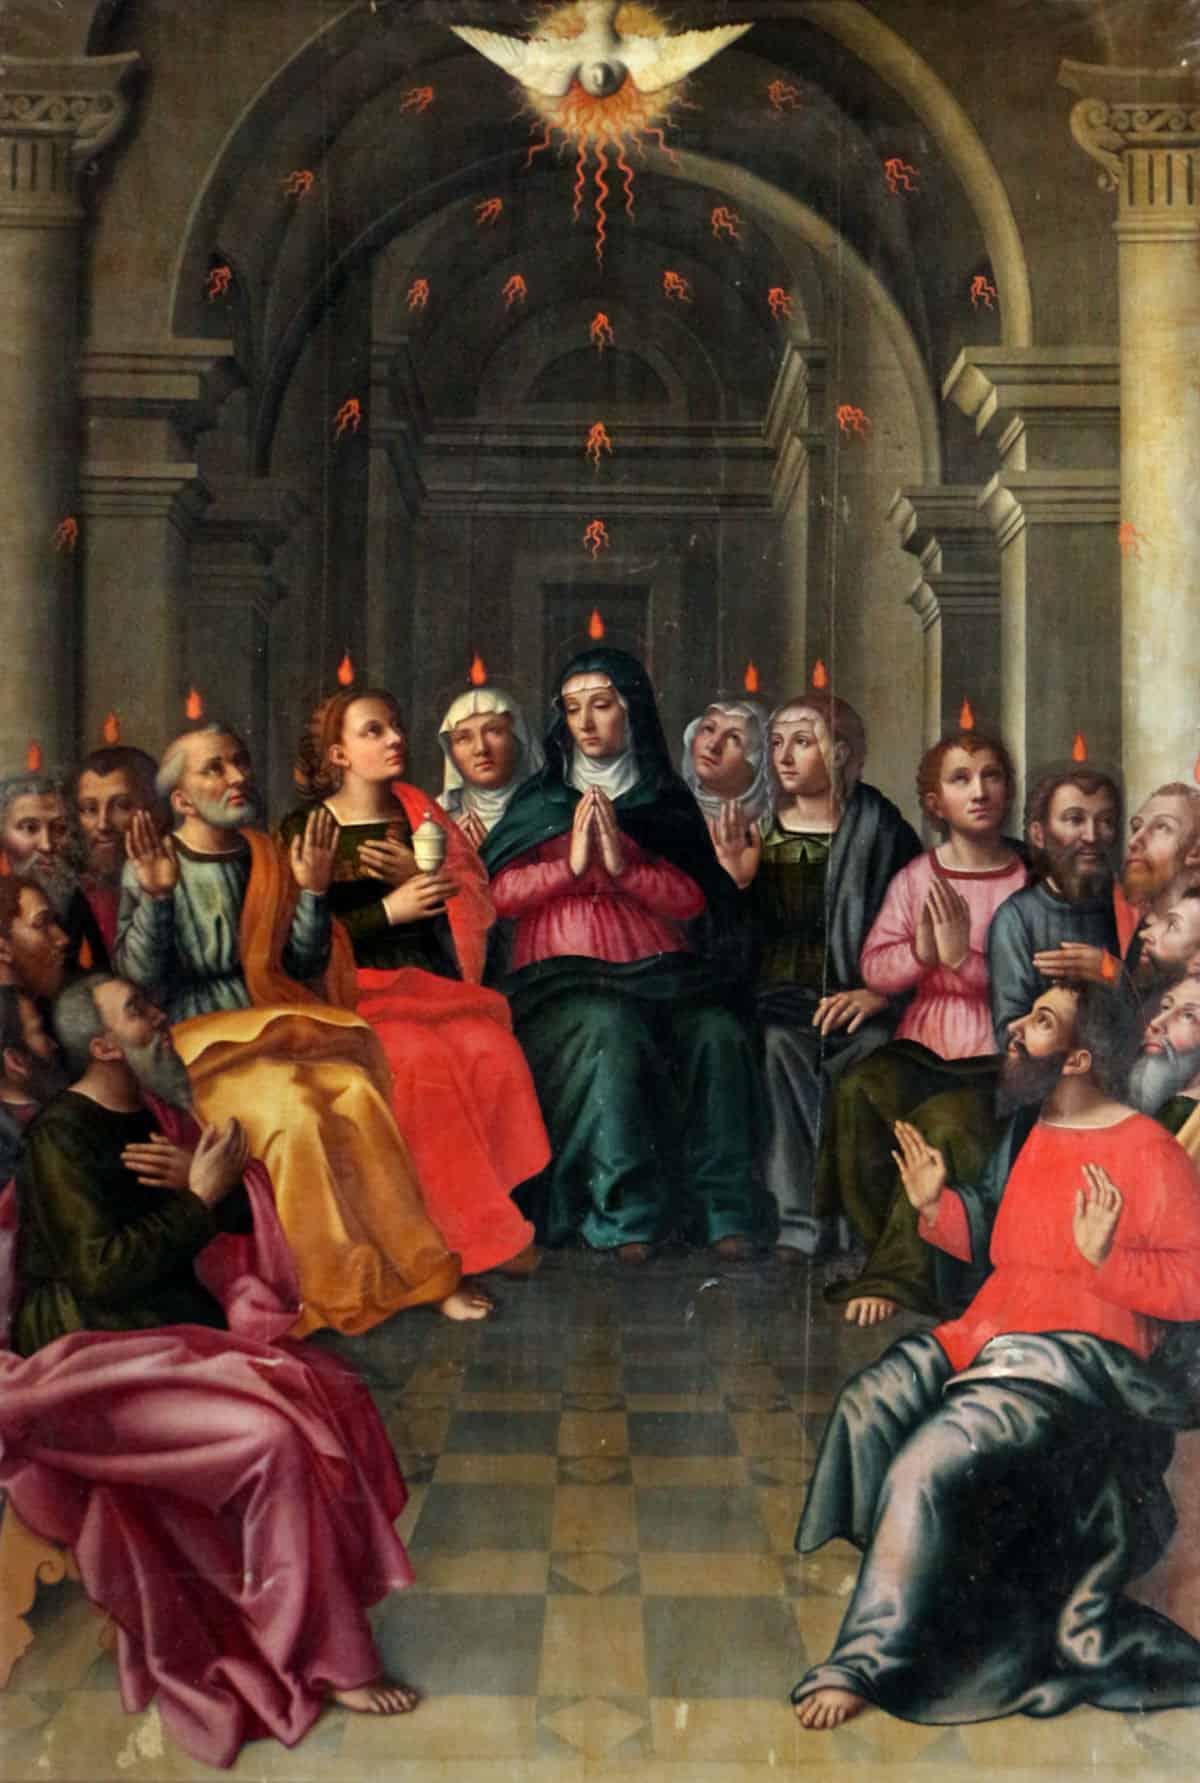 plautilla_nelli-pentecost-1554